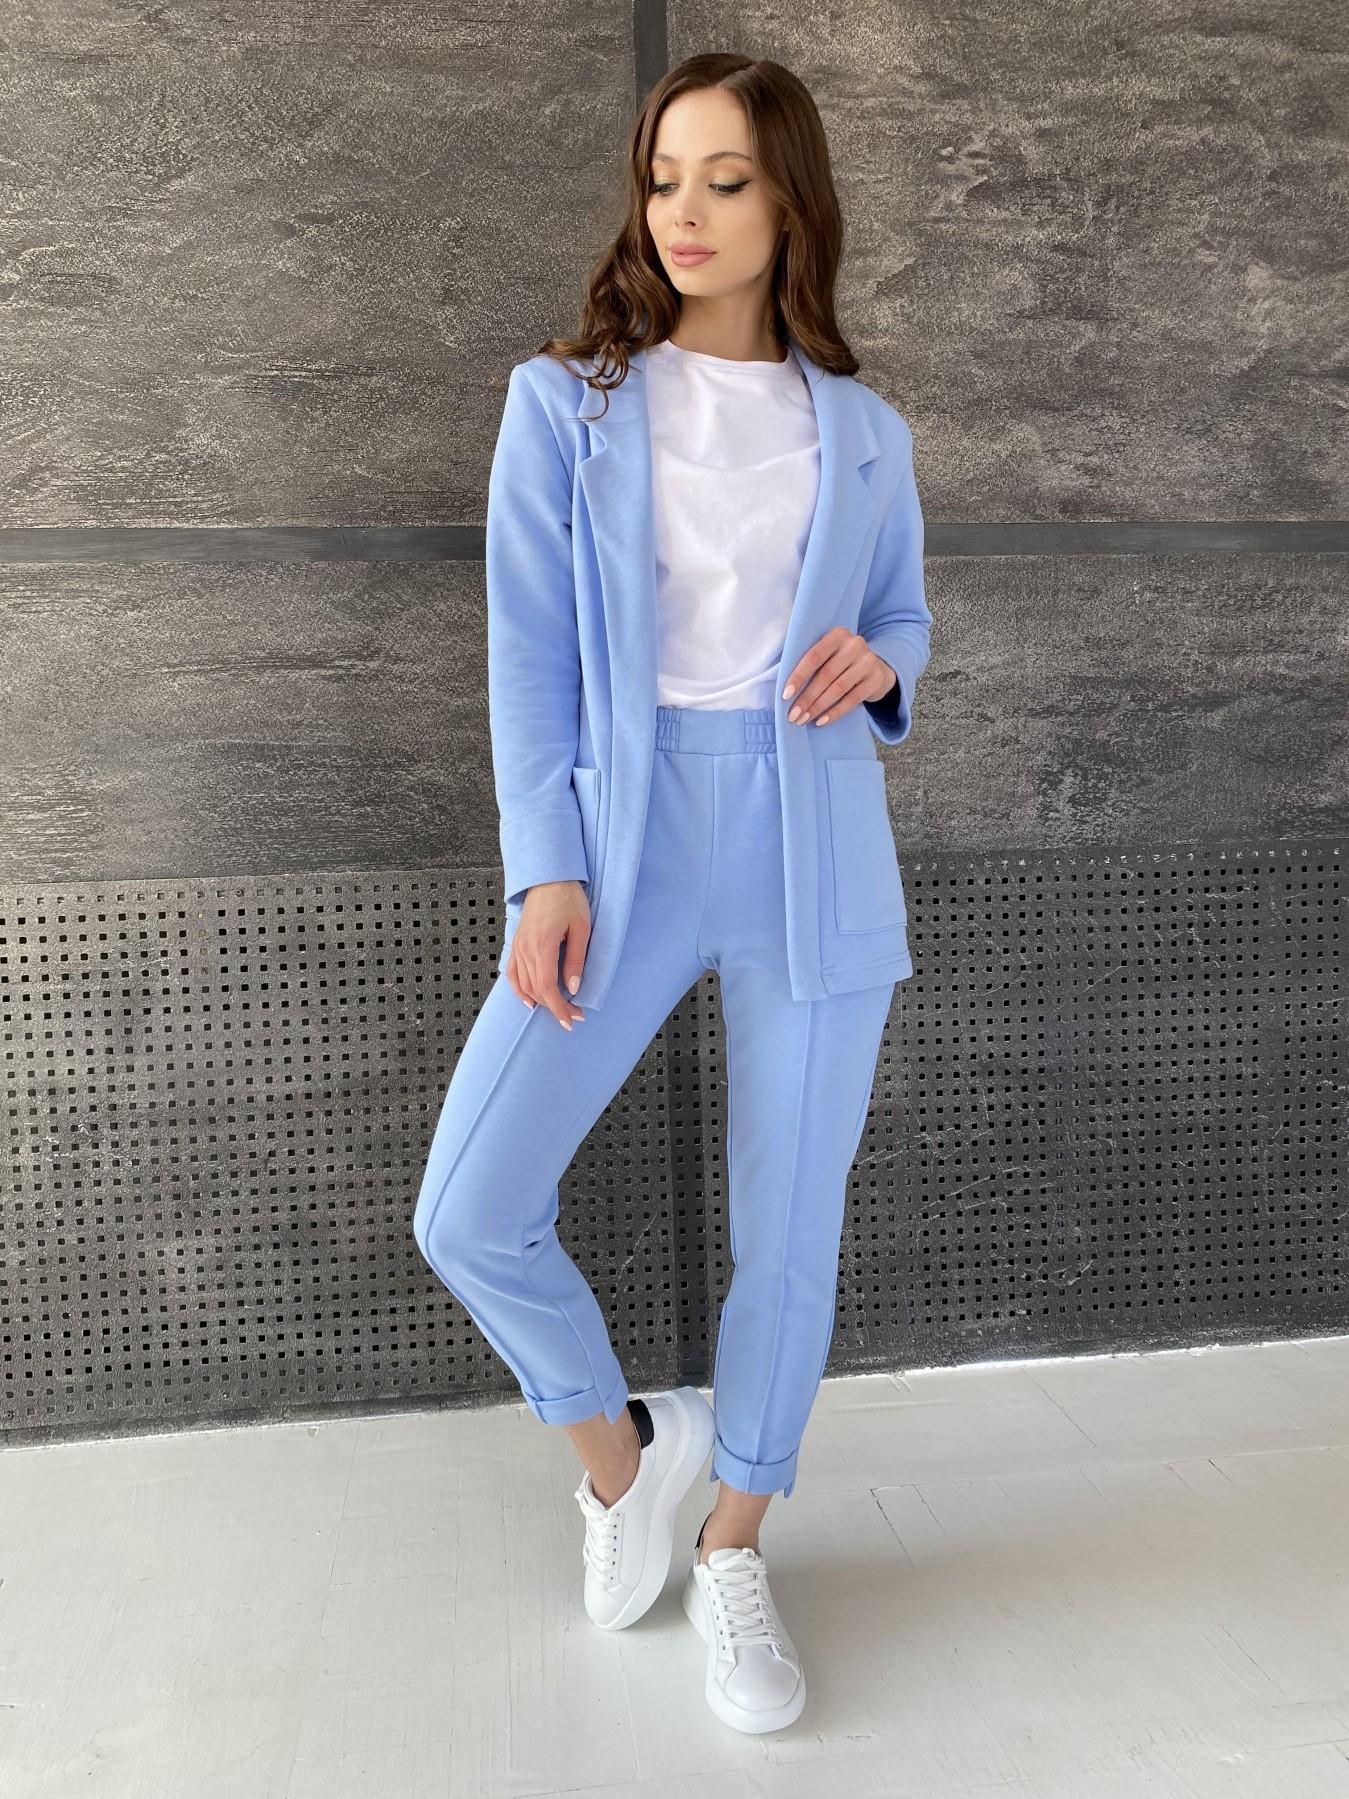 Аурис костюм трикотажный из  3х нитки 11083 АРТ. 47577 Цвет: Голубой - фото 1, интернет магазин tm-modus.ru